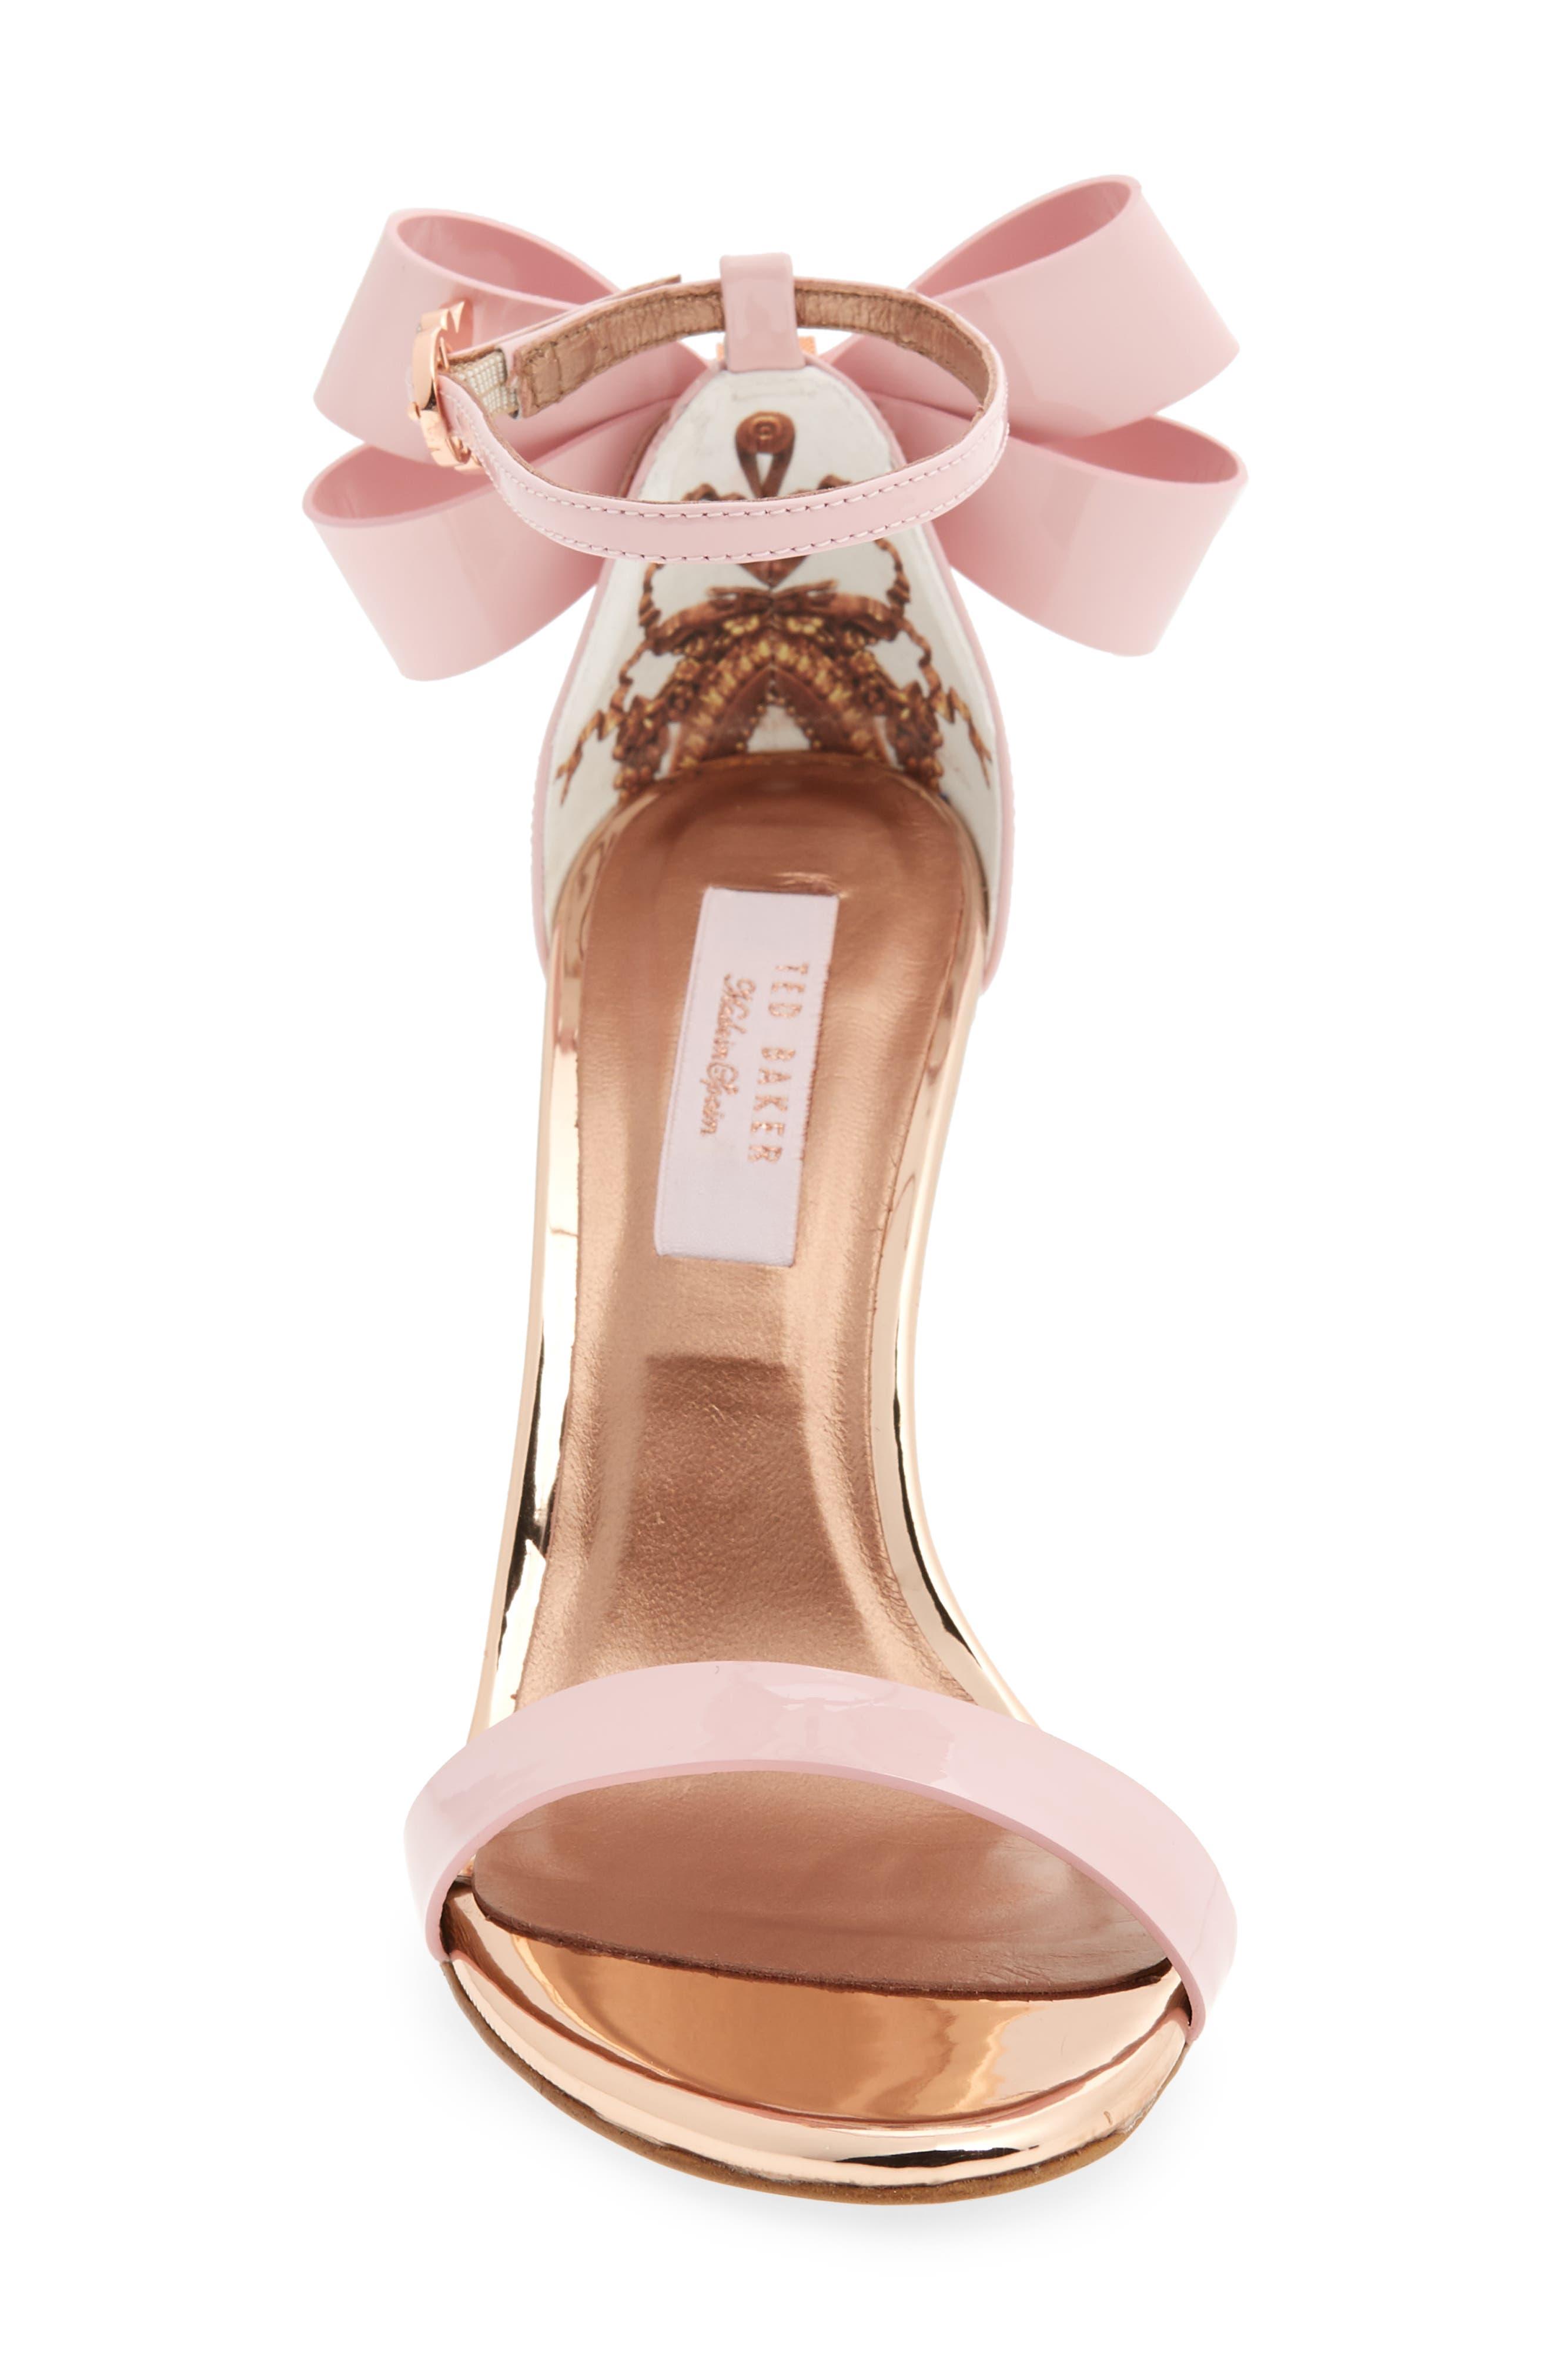 Sandalo Sandal,                             Alternate thumbnail 4, color,                             Light Pink Leather